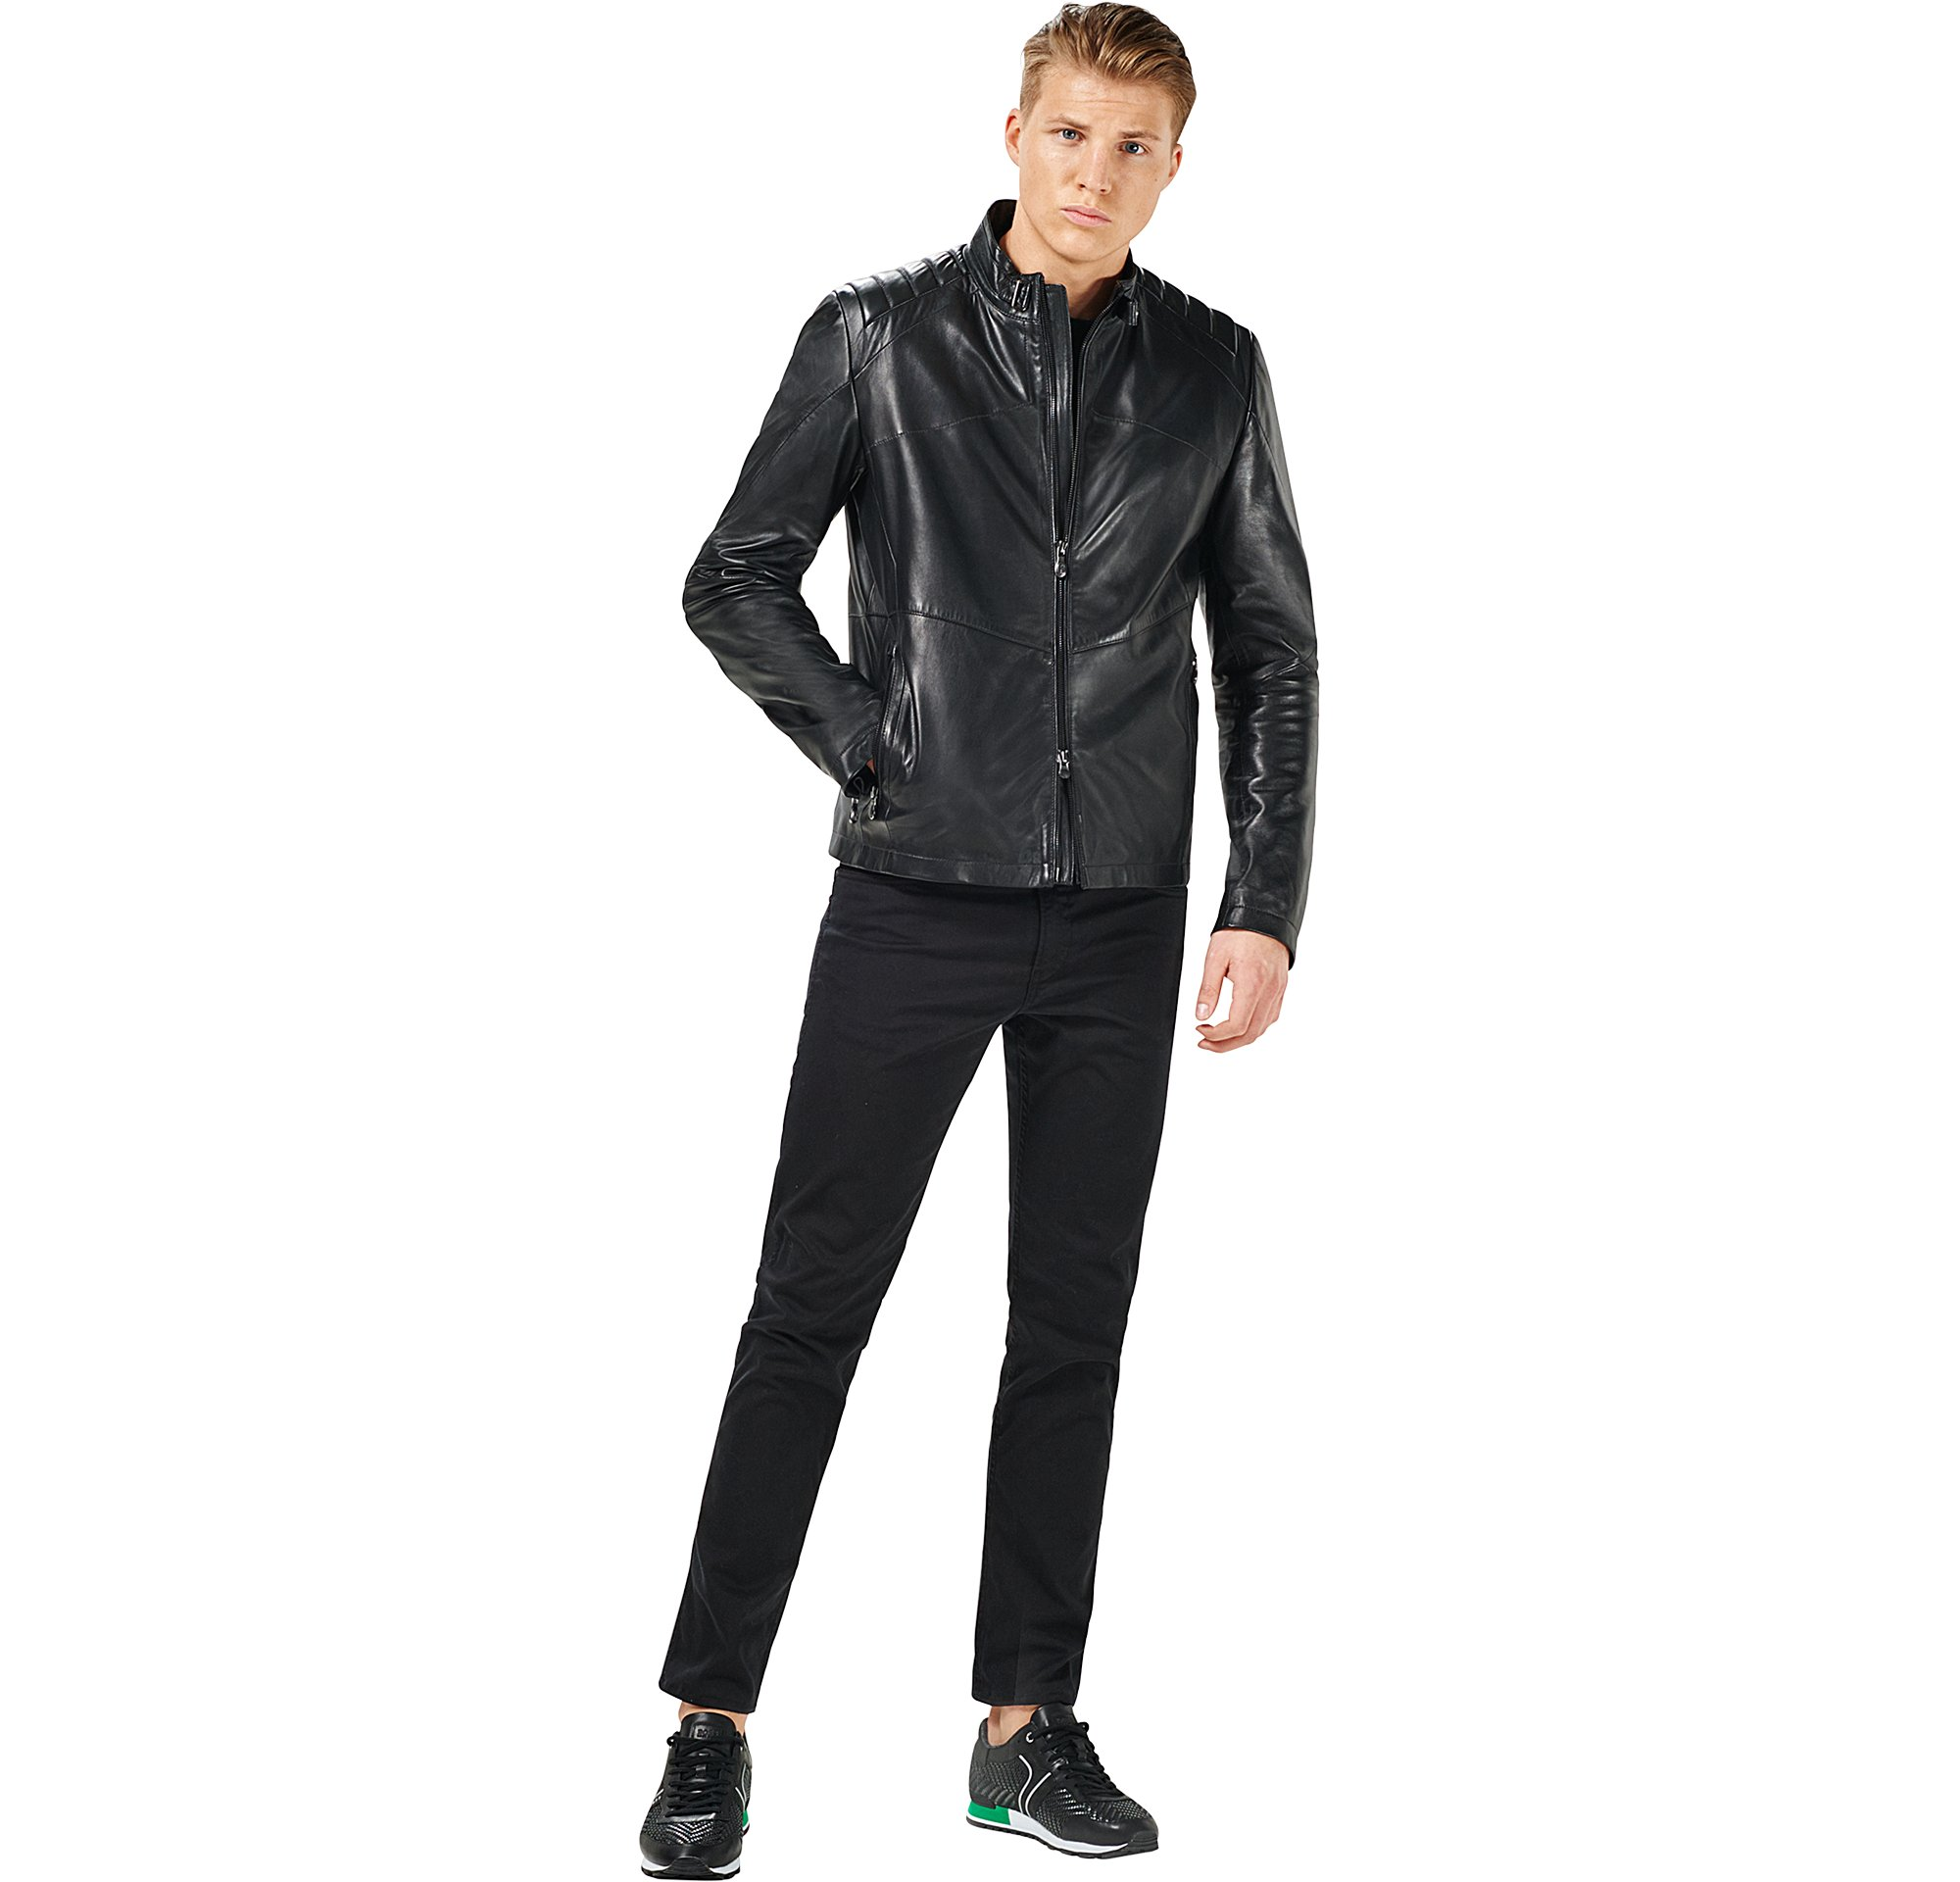 Leren jas, gebreide trui, jeans en schoenen van BOSS Green Menswear